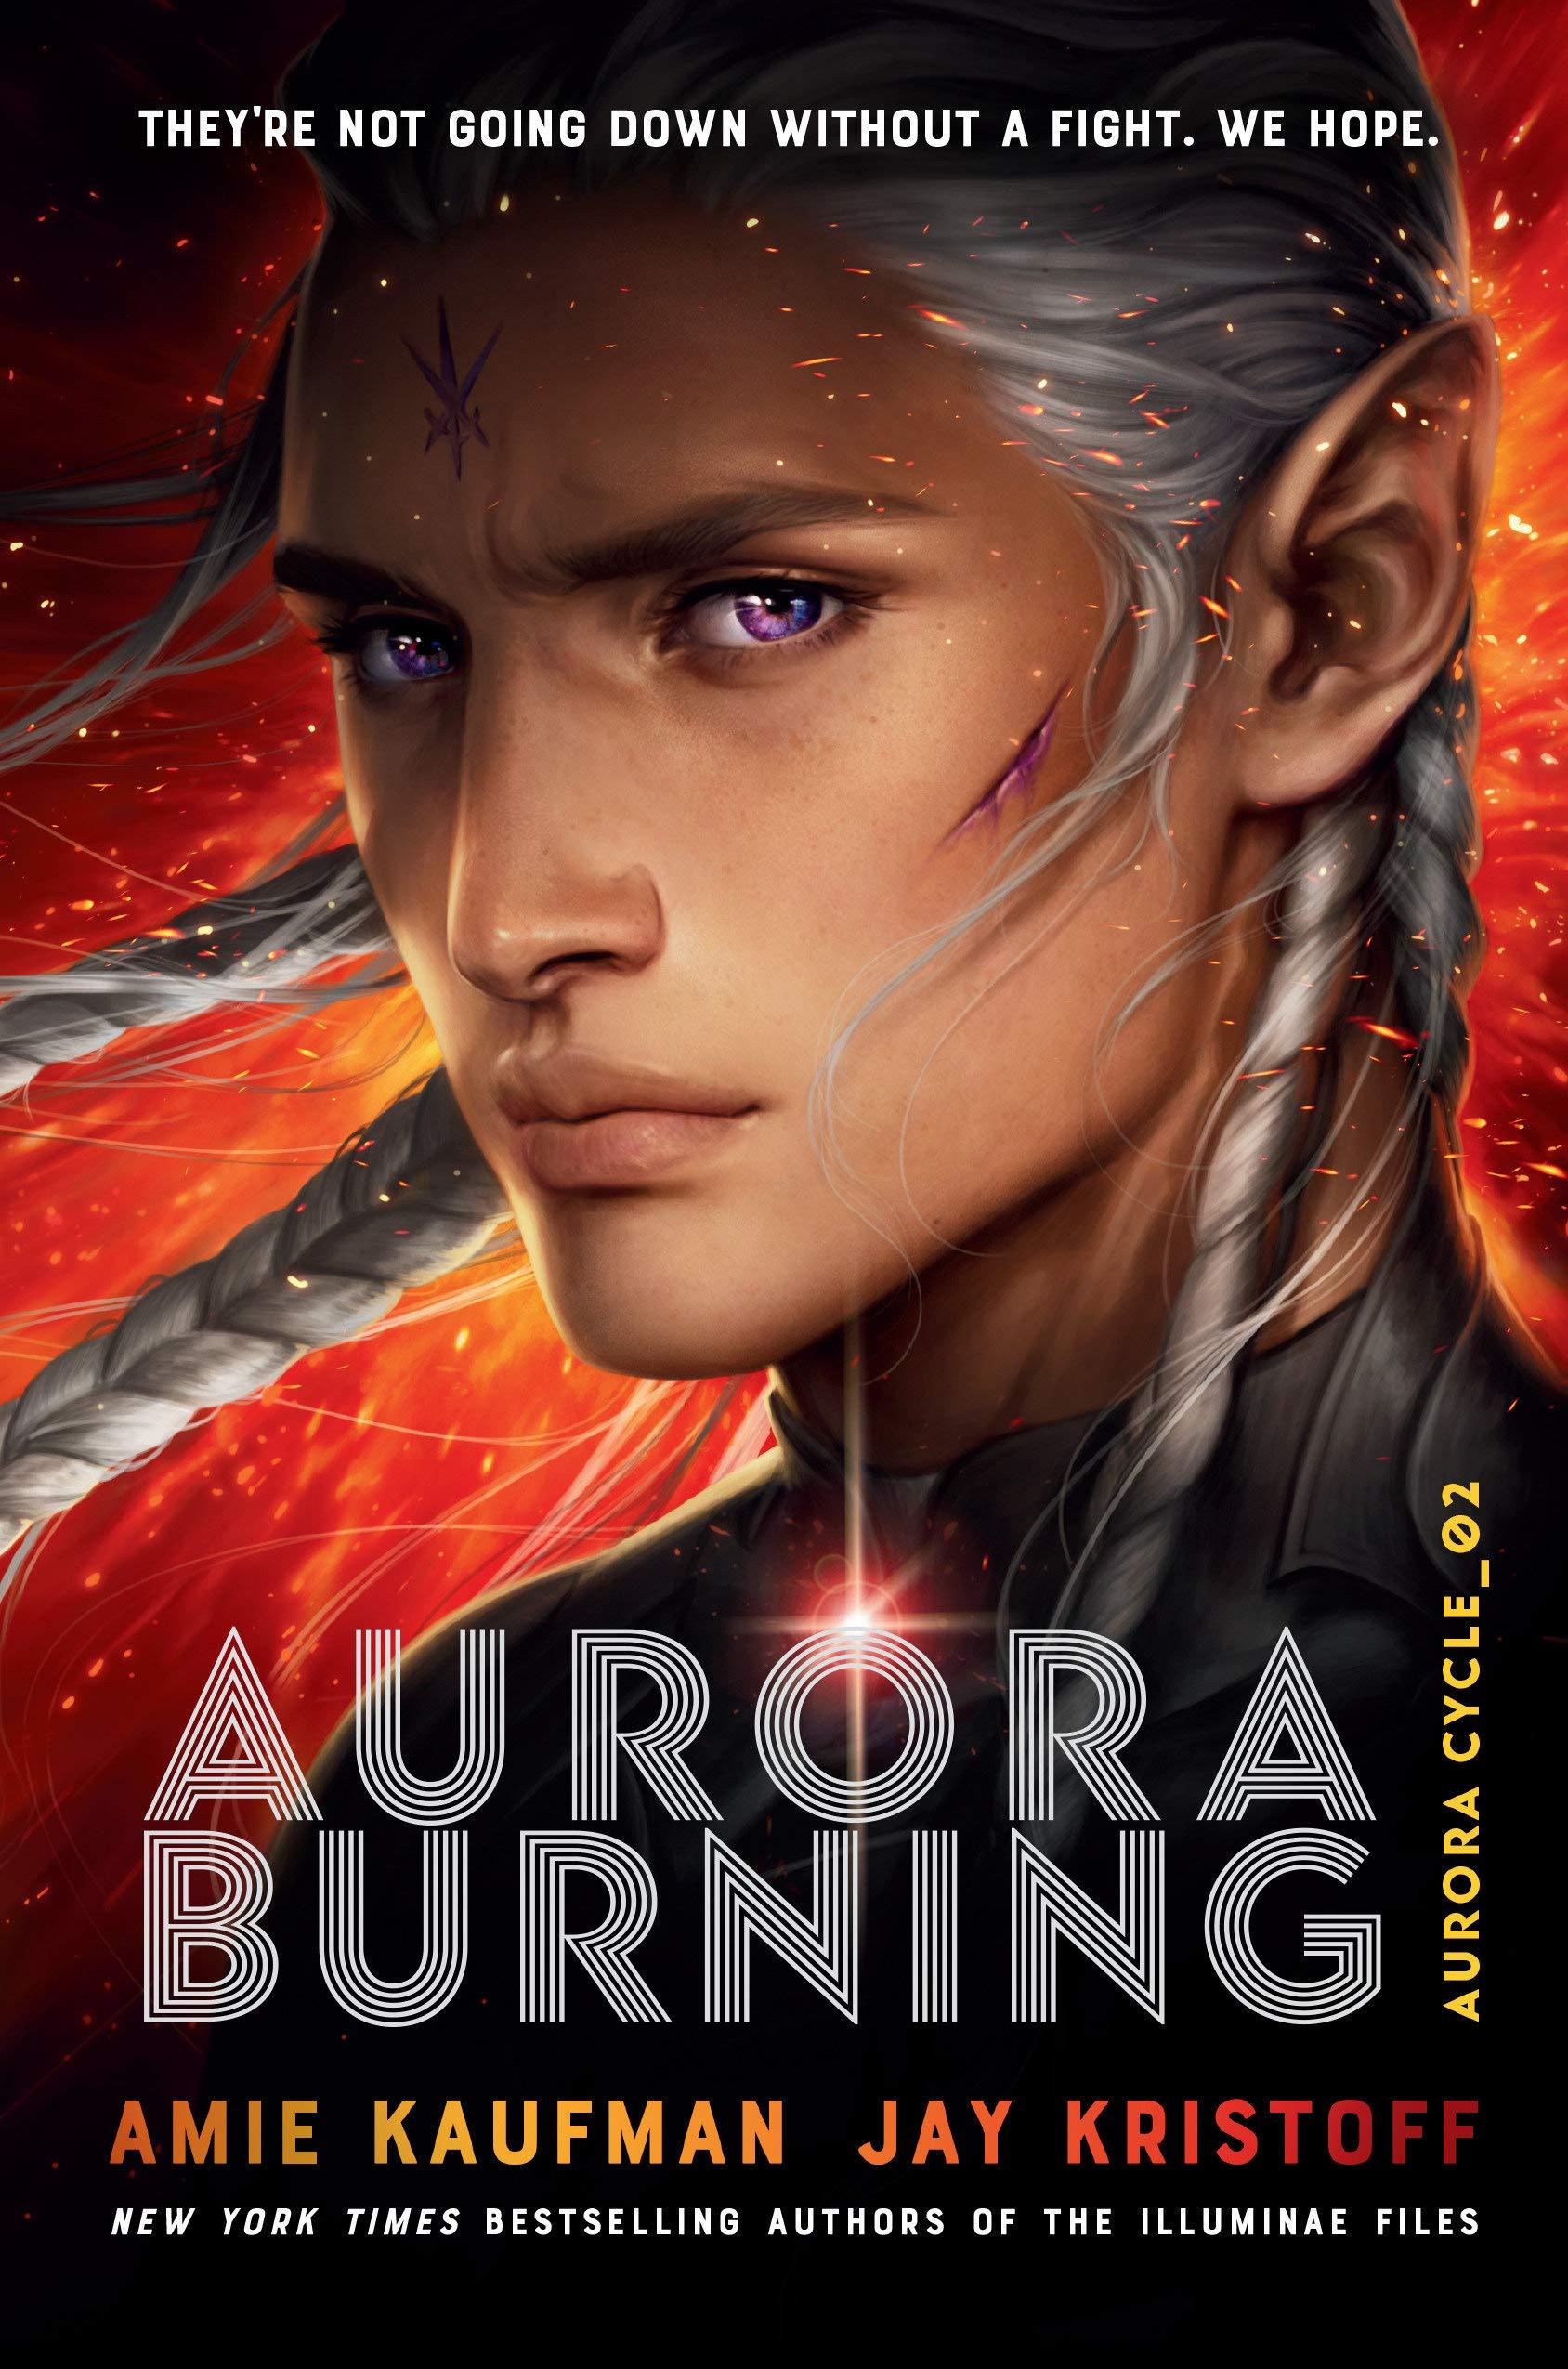 Amazon.com: Aurora Burning (The Aurora Cycle) (9781524720926): Kaufman,  Amie, Kristoff, Jay: Books